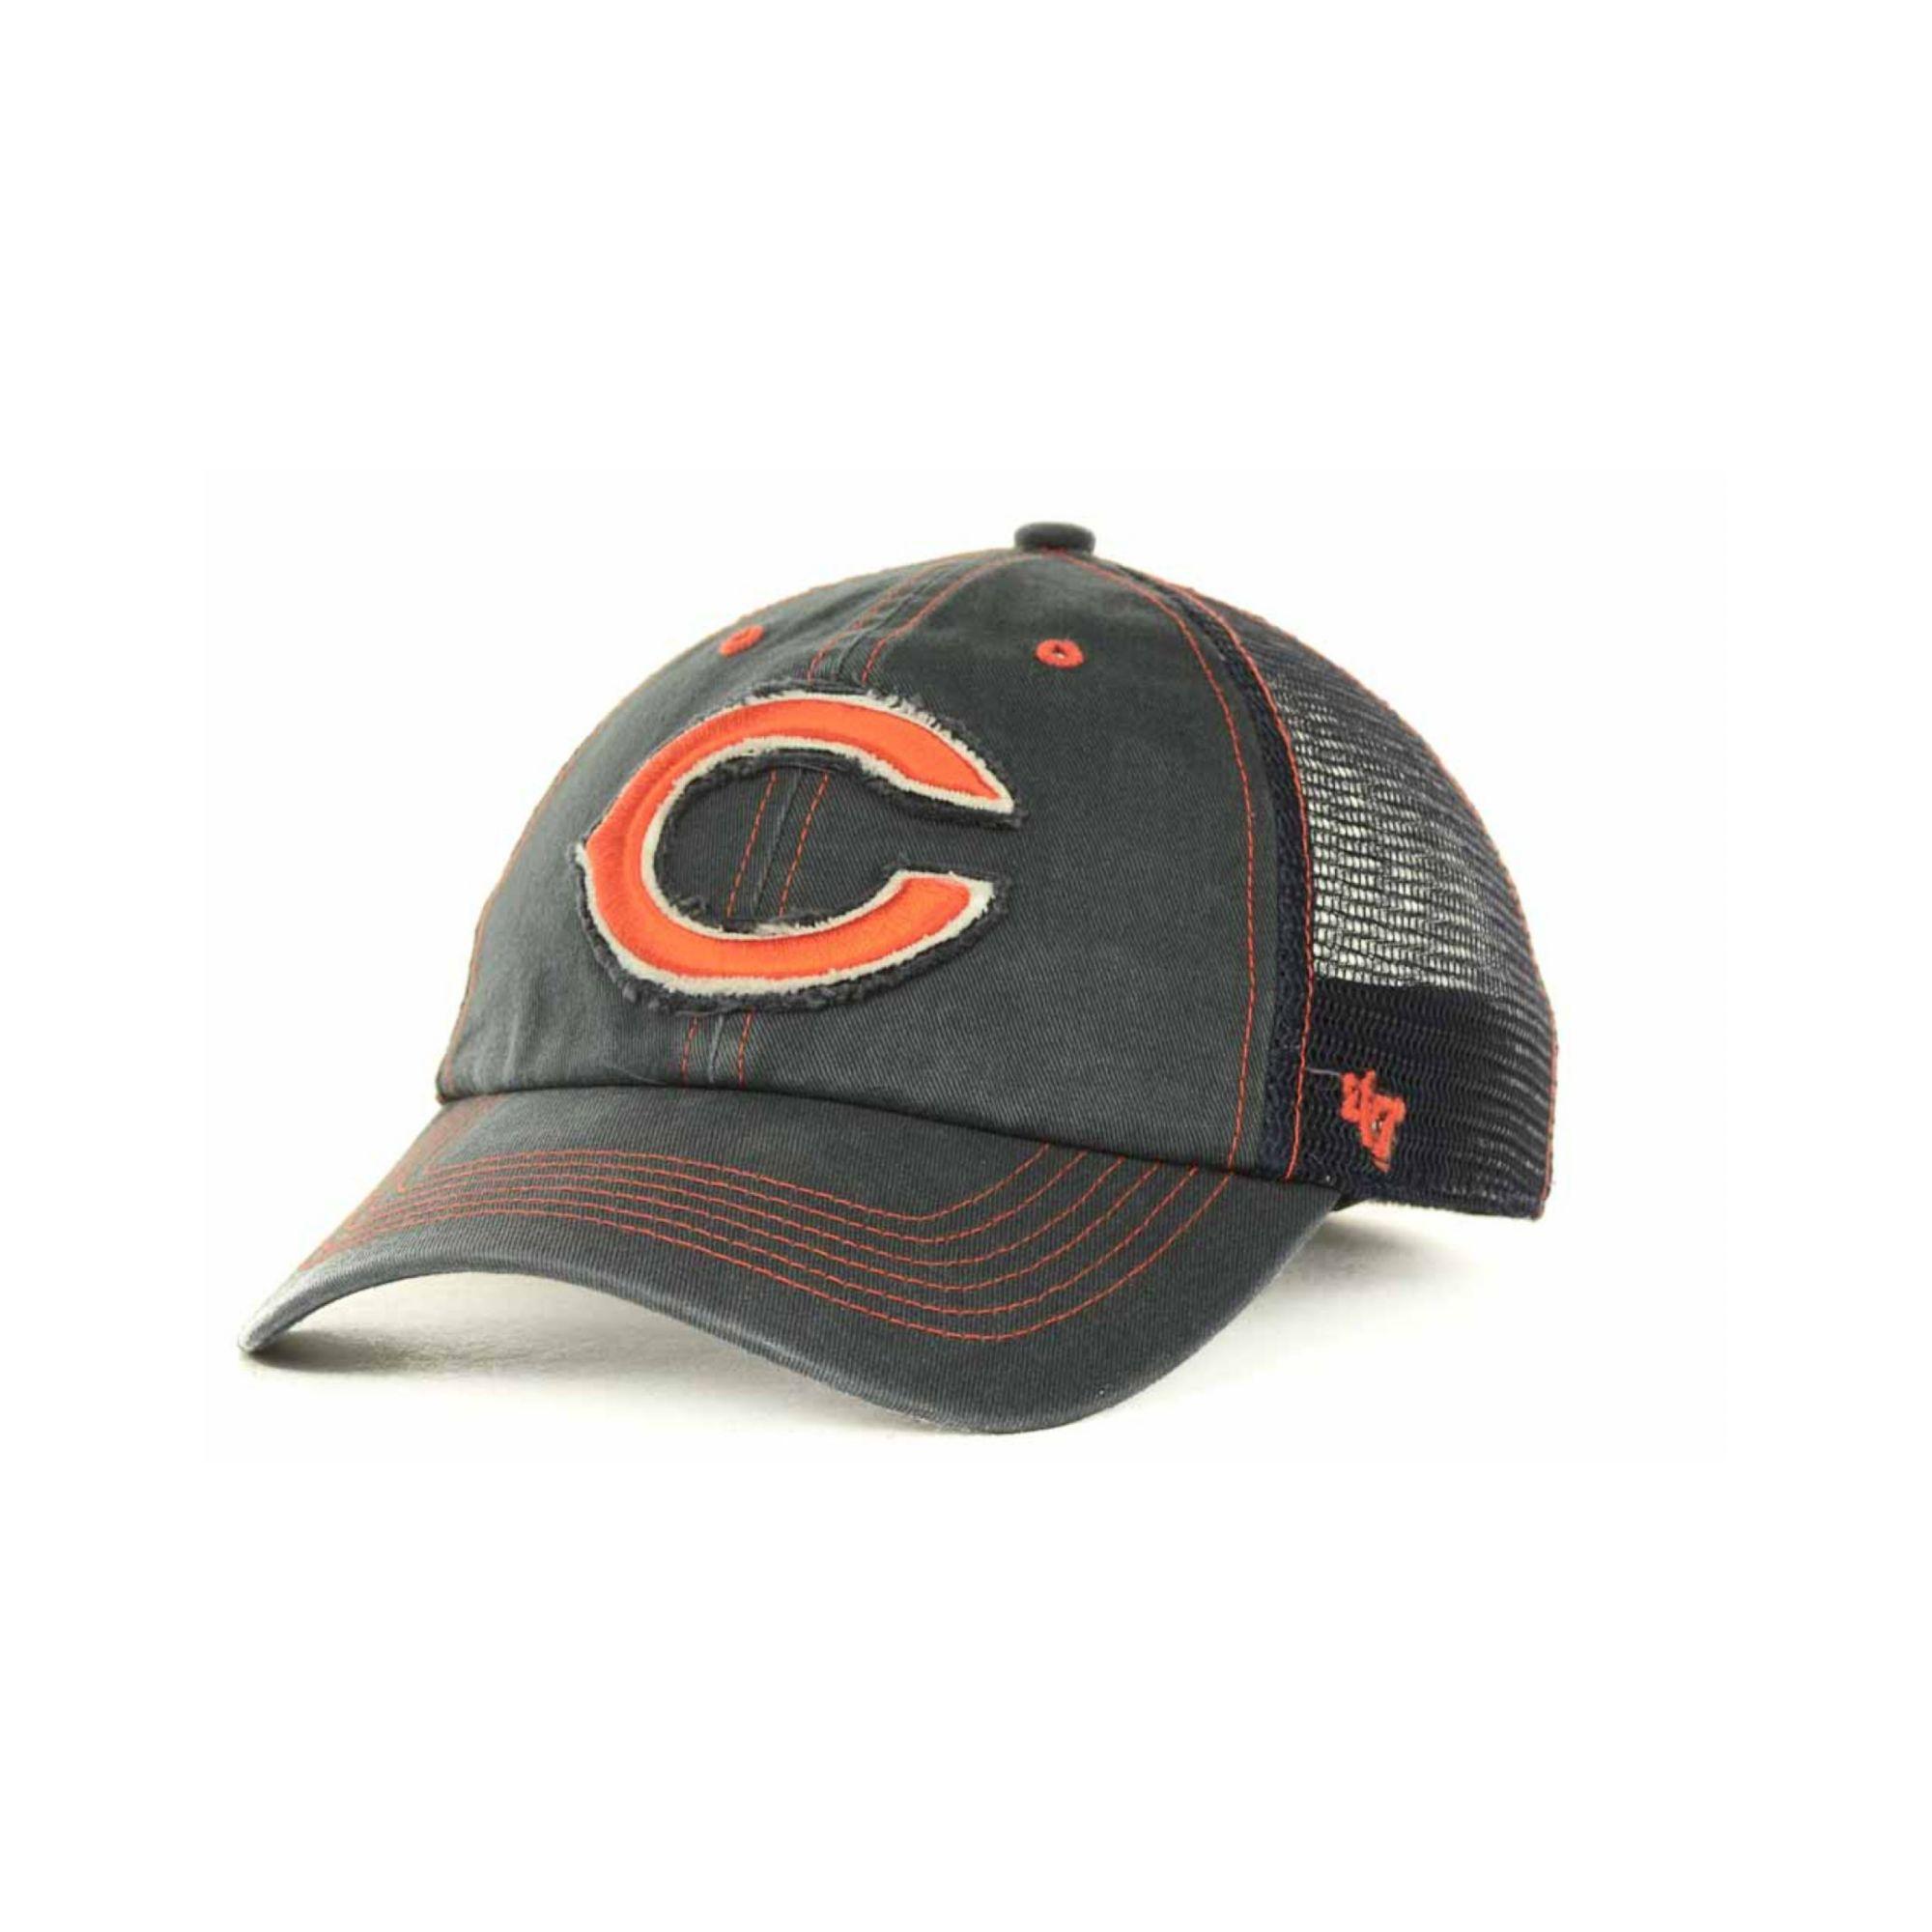 618dee4a8af00 sweden nfl chicago bears clean up adjustable hat one size navy 395c5 a6a45   netherlands lyst 47 brand chicago bears flexbone cap in blue for men c3bd8  7249b